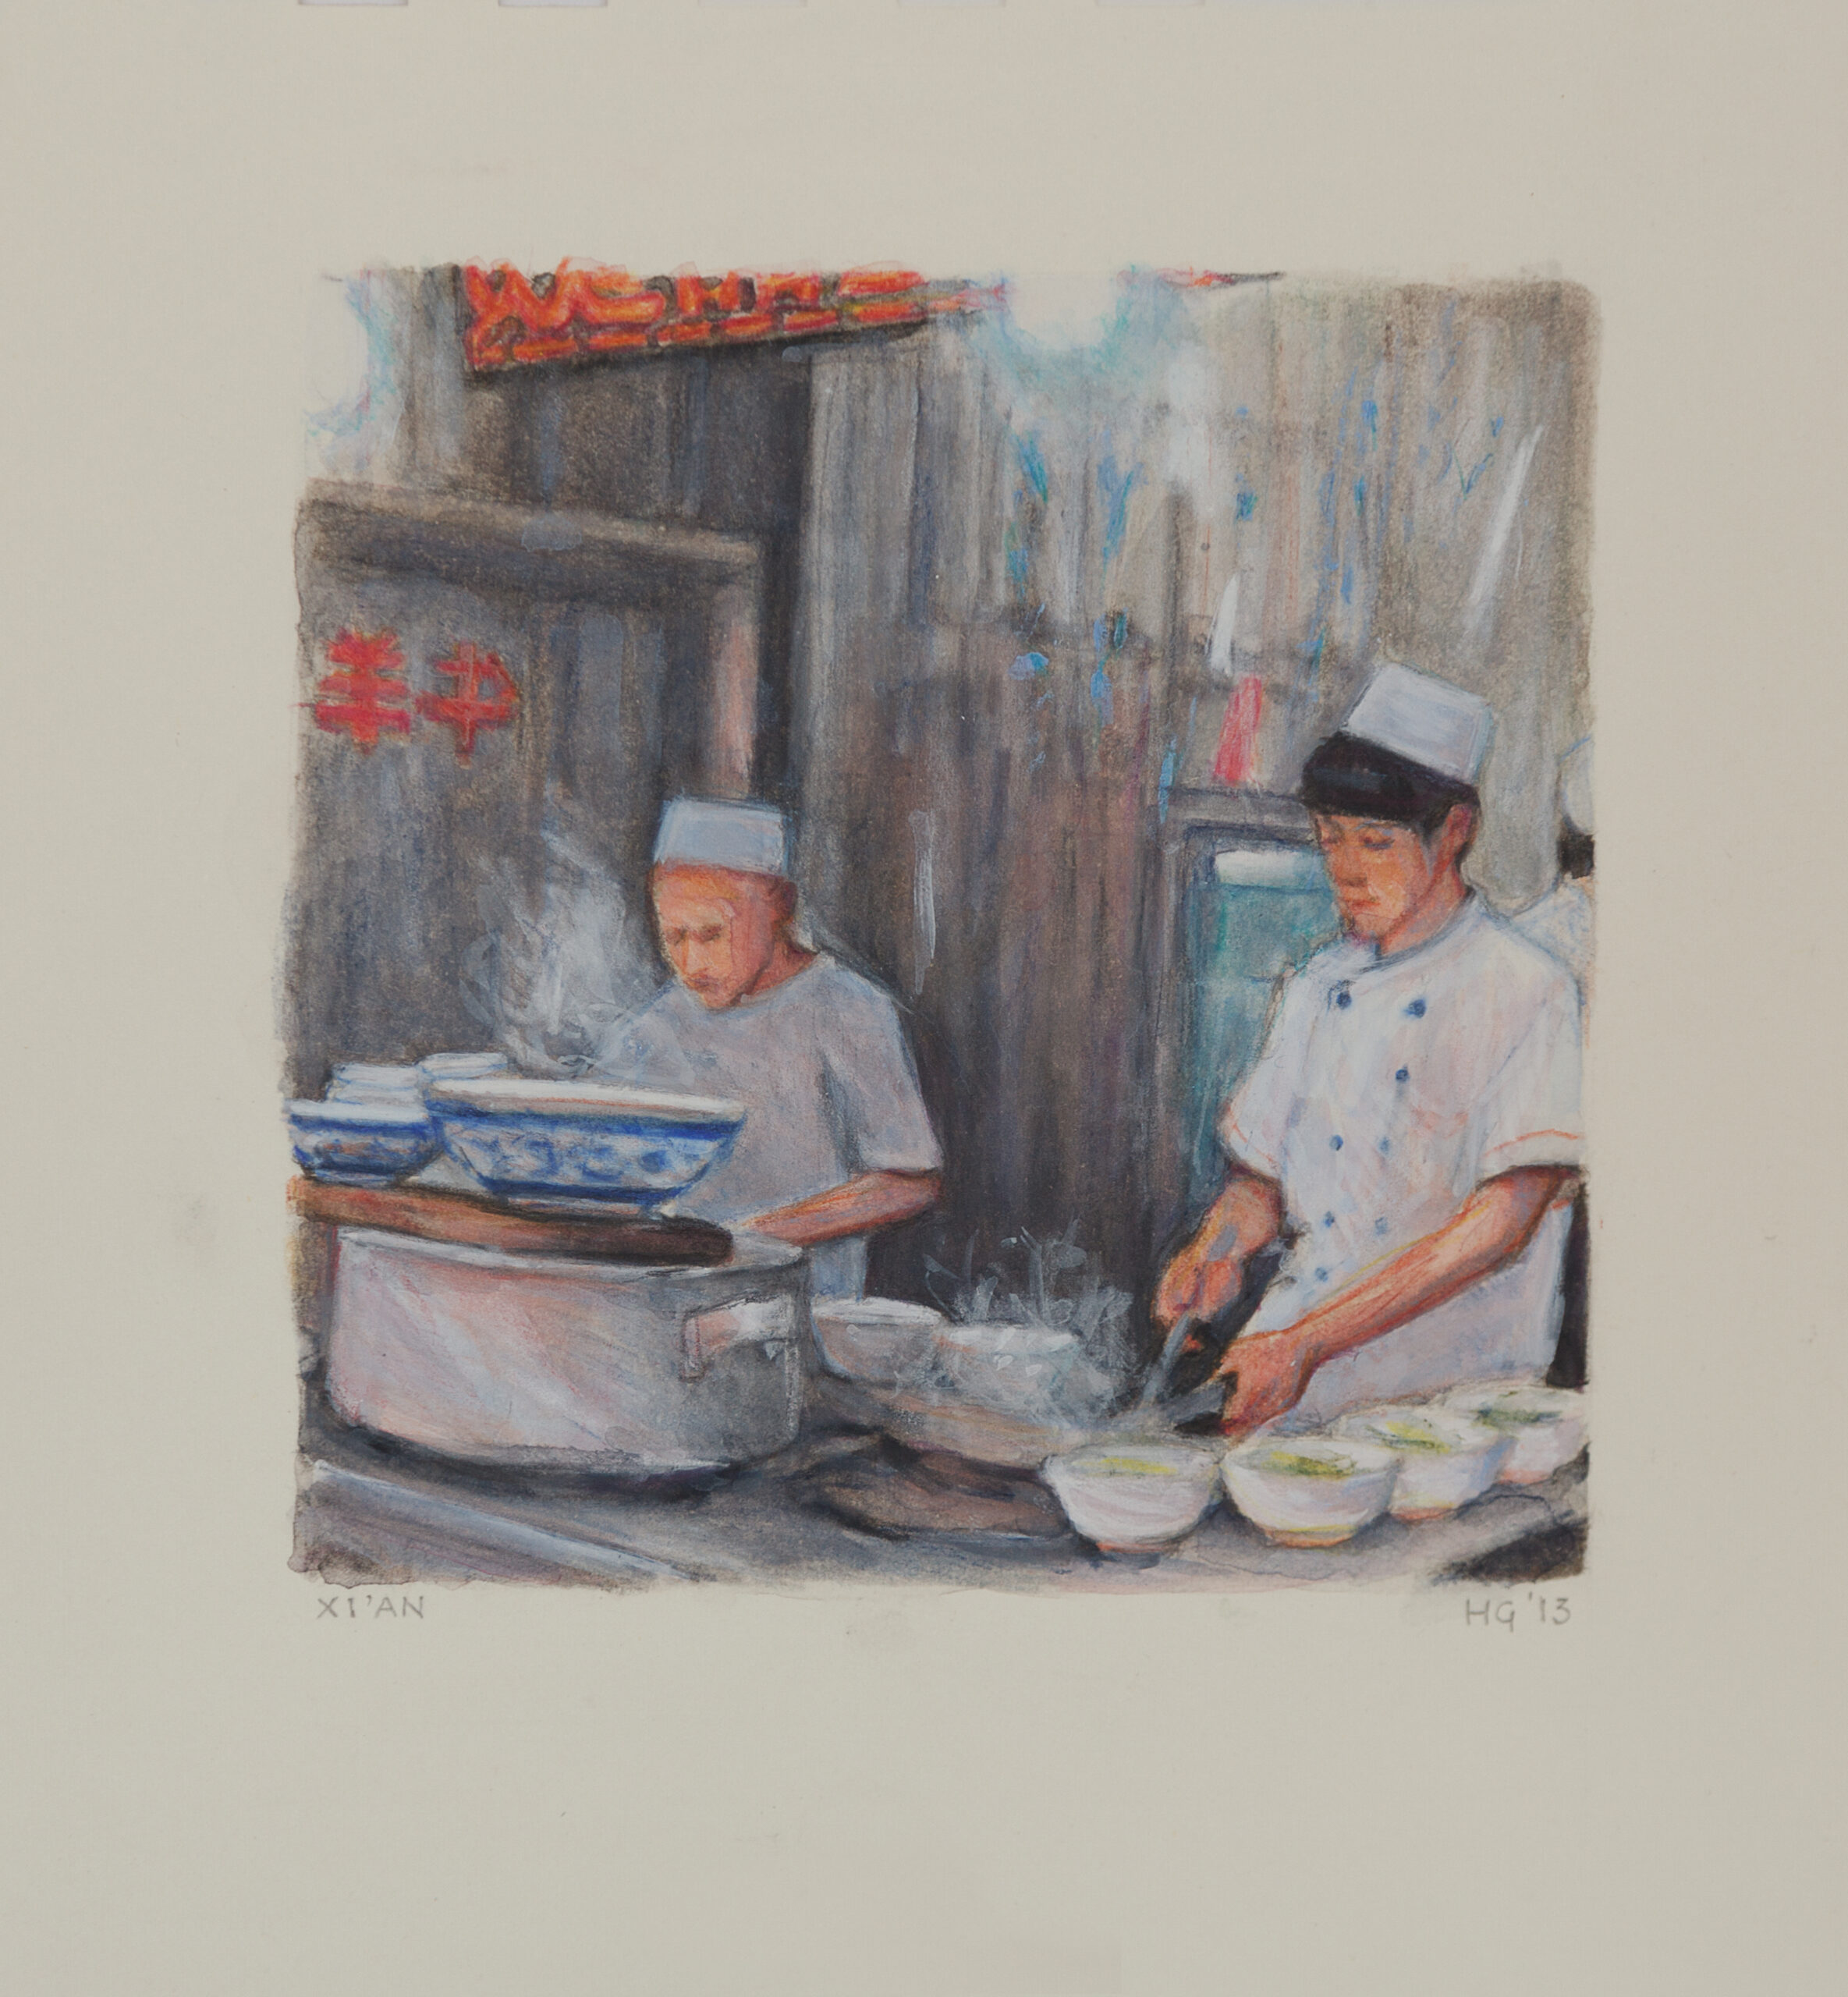 33.Hetty-Geursen_China_Xi-An-wokkie-wokkie